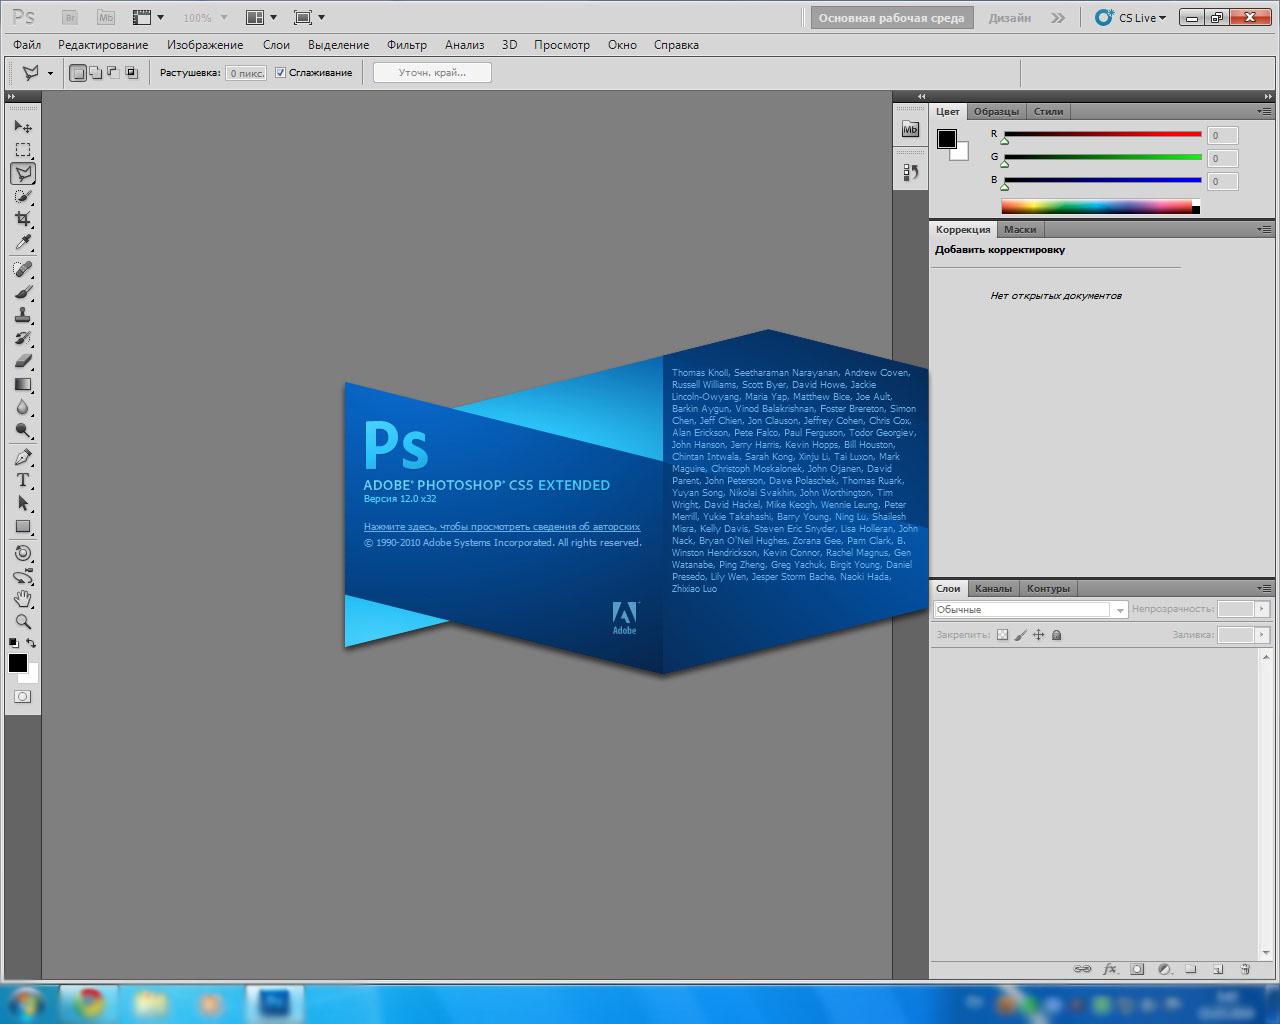 Adobe photoshop cs4 extended final portable edition